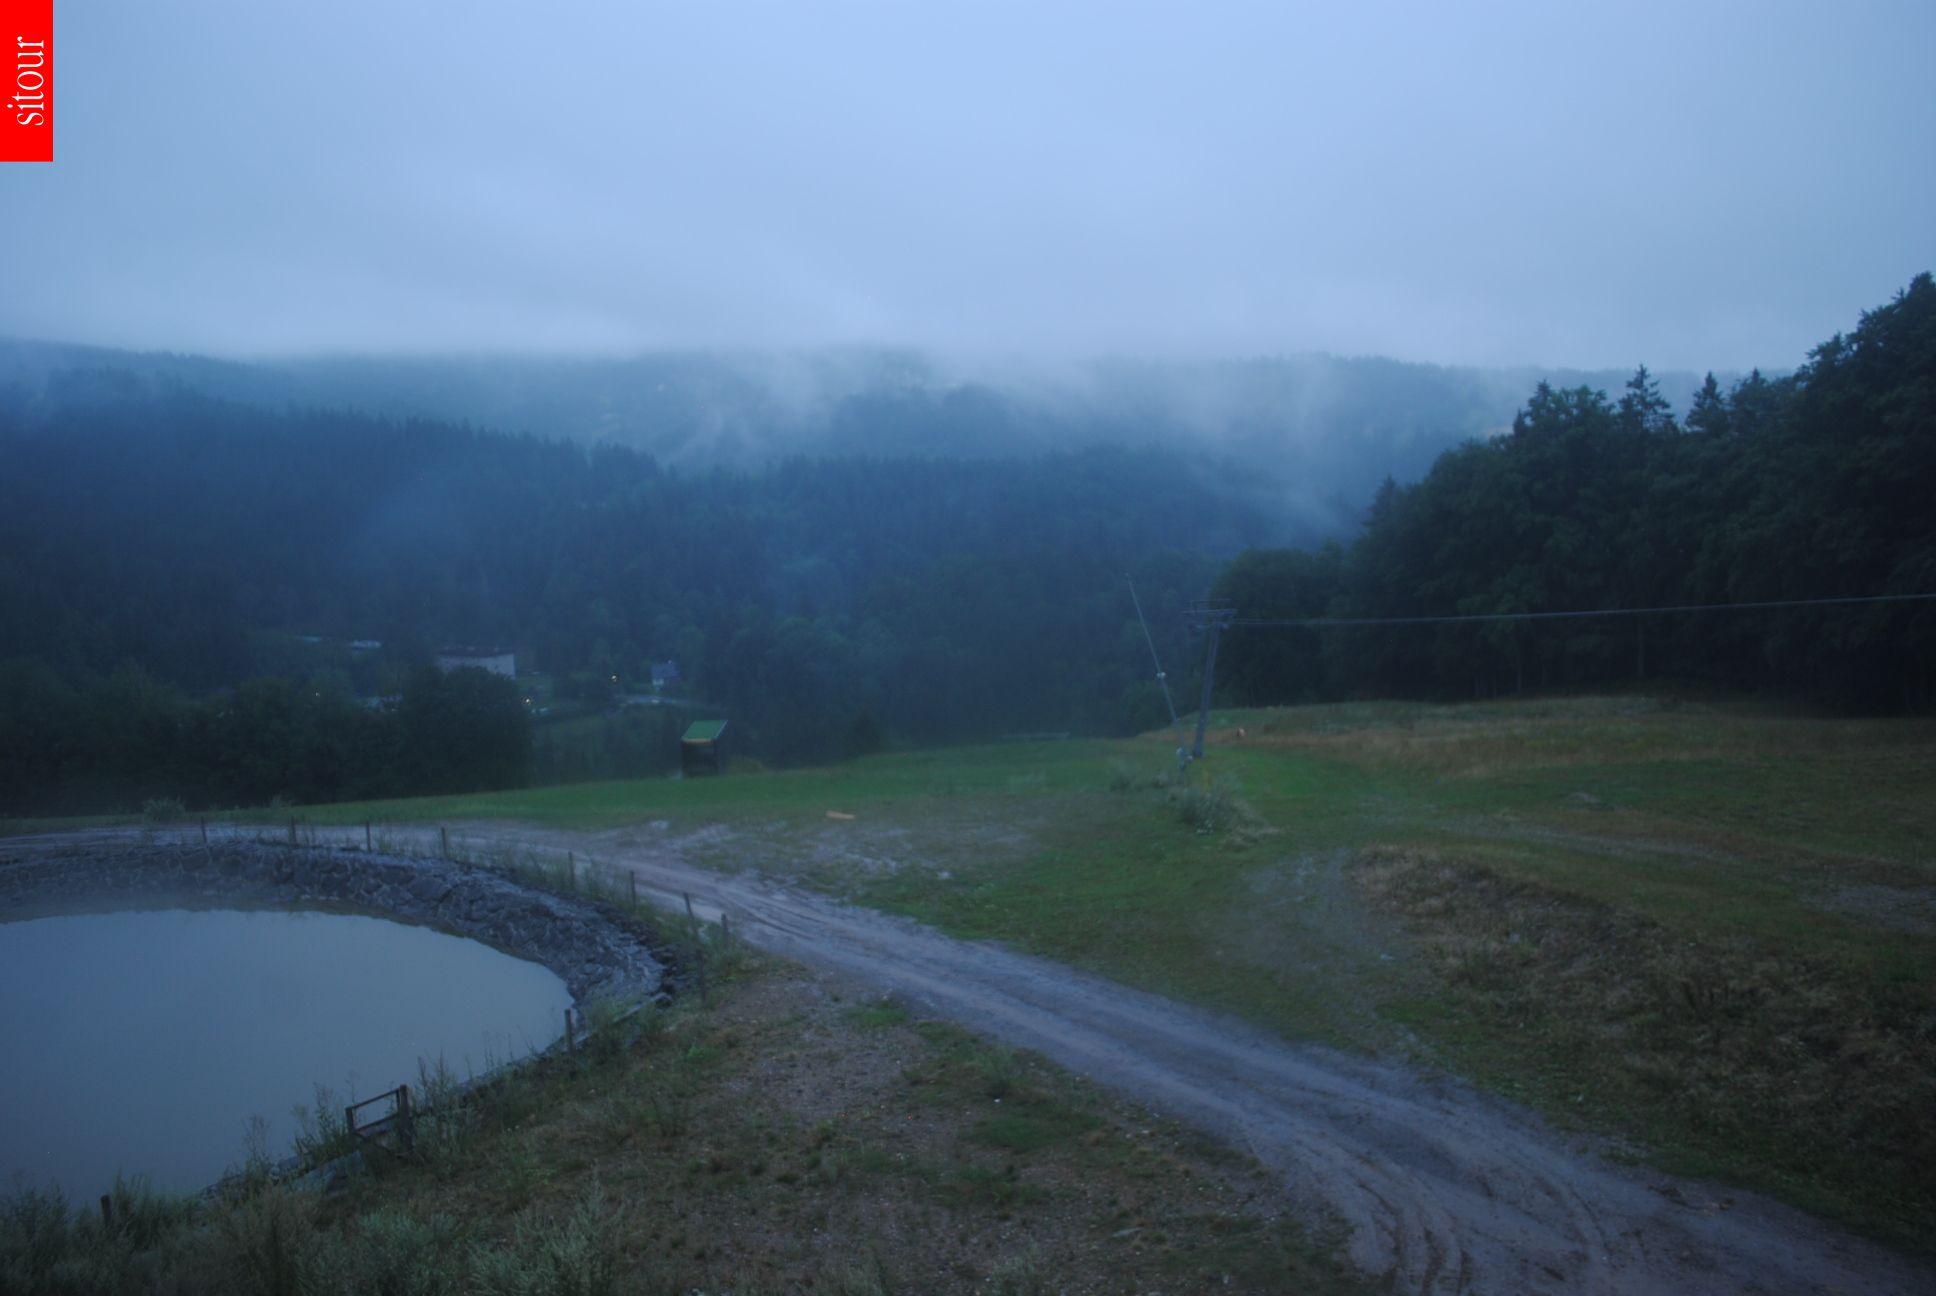 Webcam Skigebied Vitkovice cam 3 - Reuzengebergte